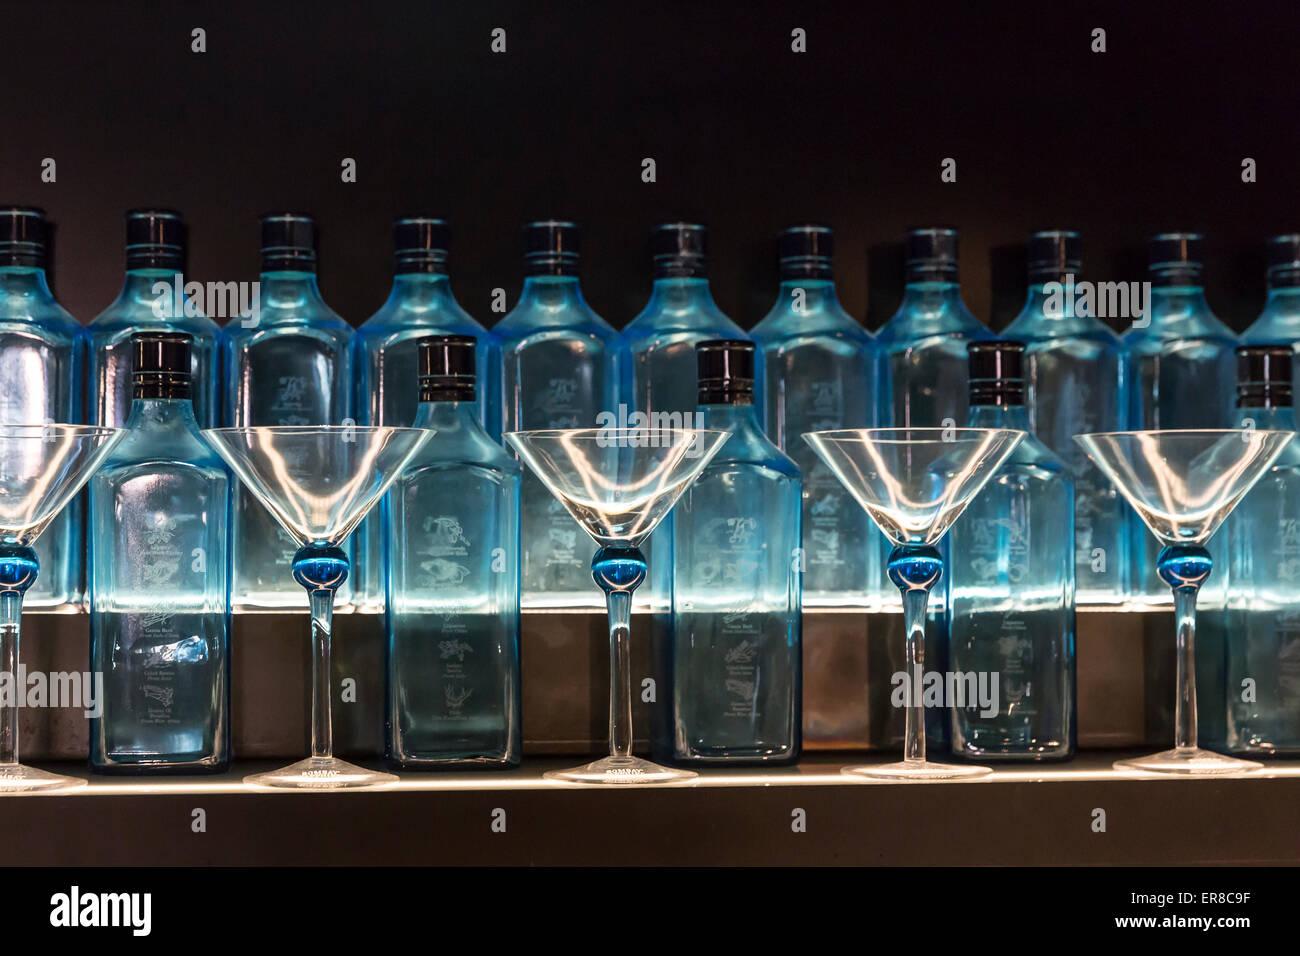 Gin Shop, Bombay Sapphire Brennerei Visitor Centre, Laverstoke, Hampshire, England, UK. Stockbild